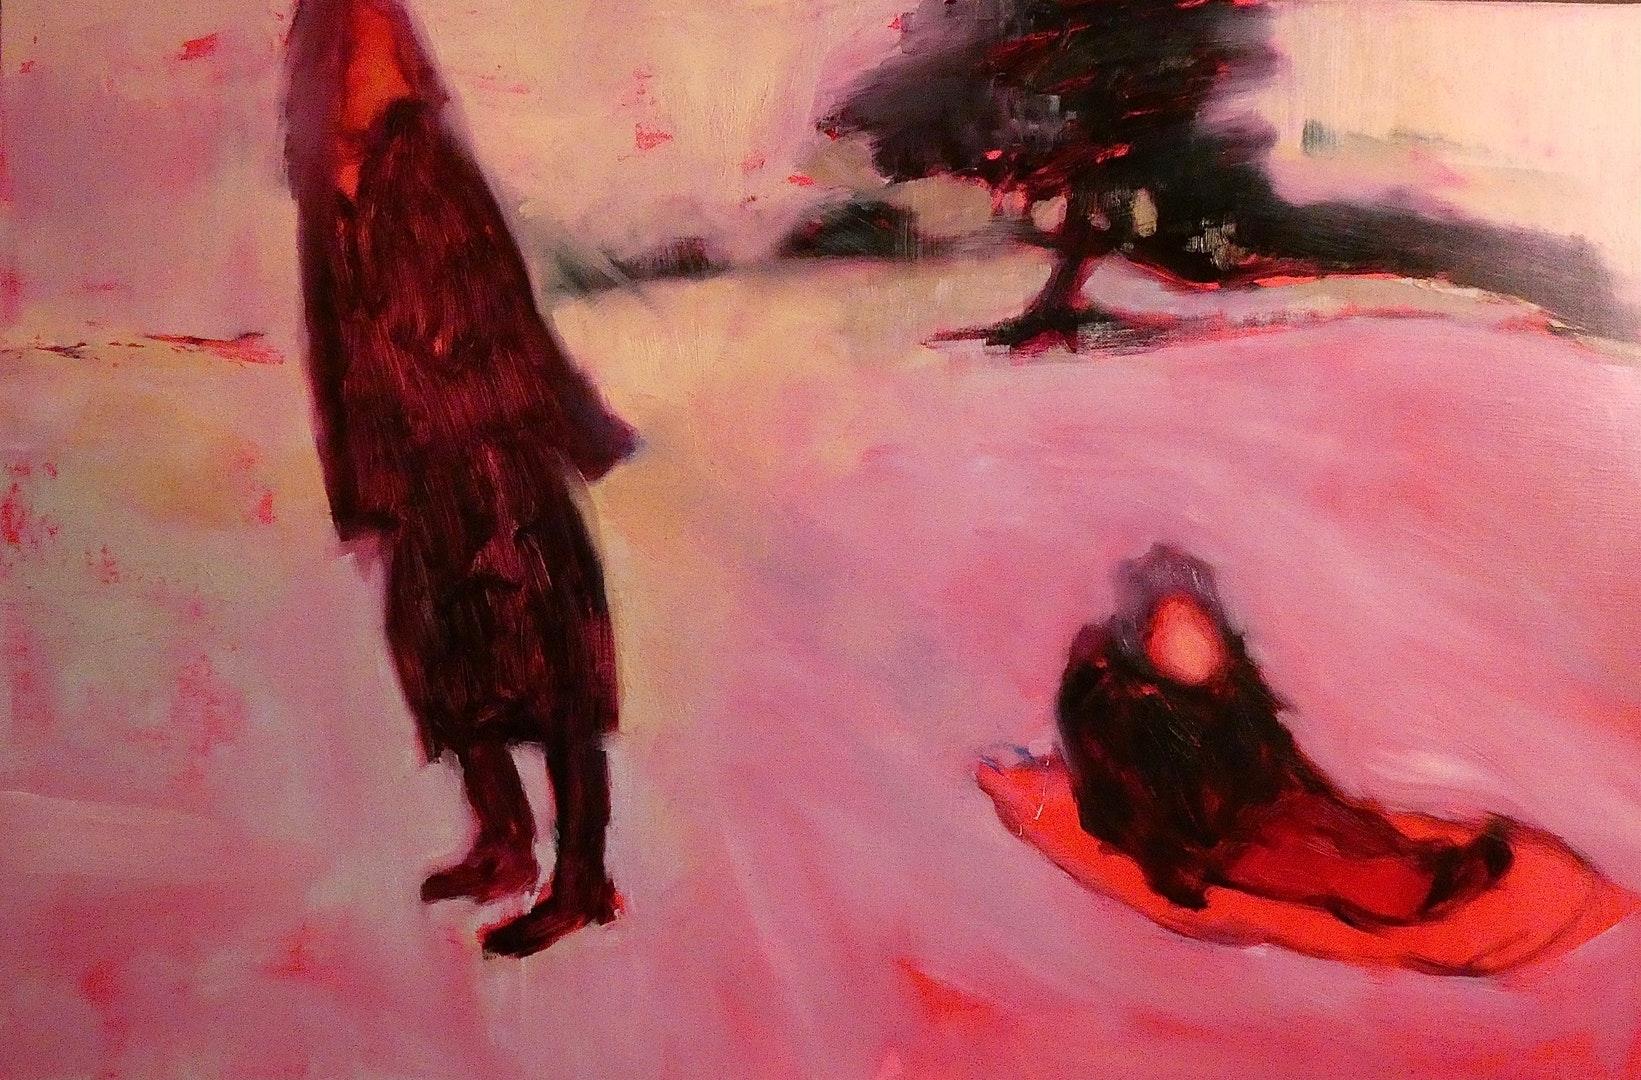 'Muruaneq', Carrie Stanley, Oil on canvas, 40 x 60 cm